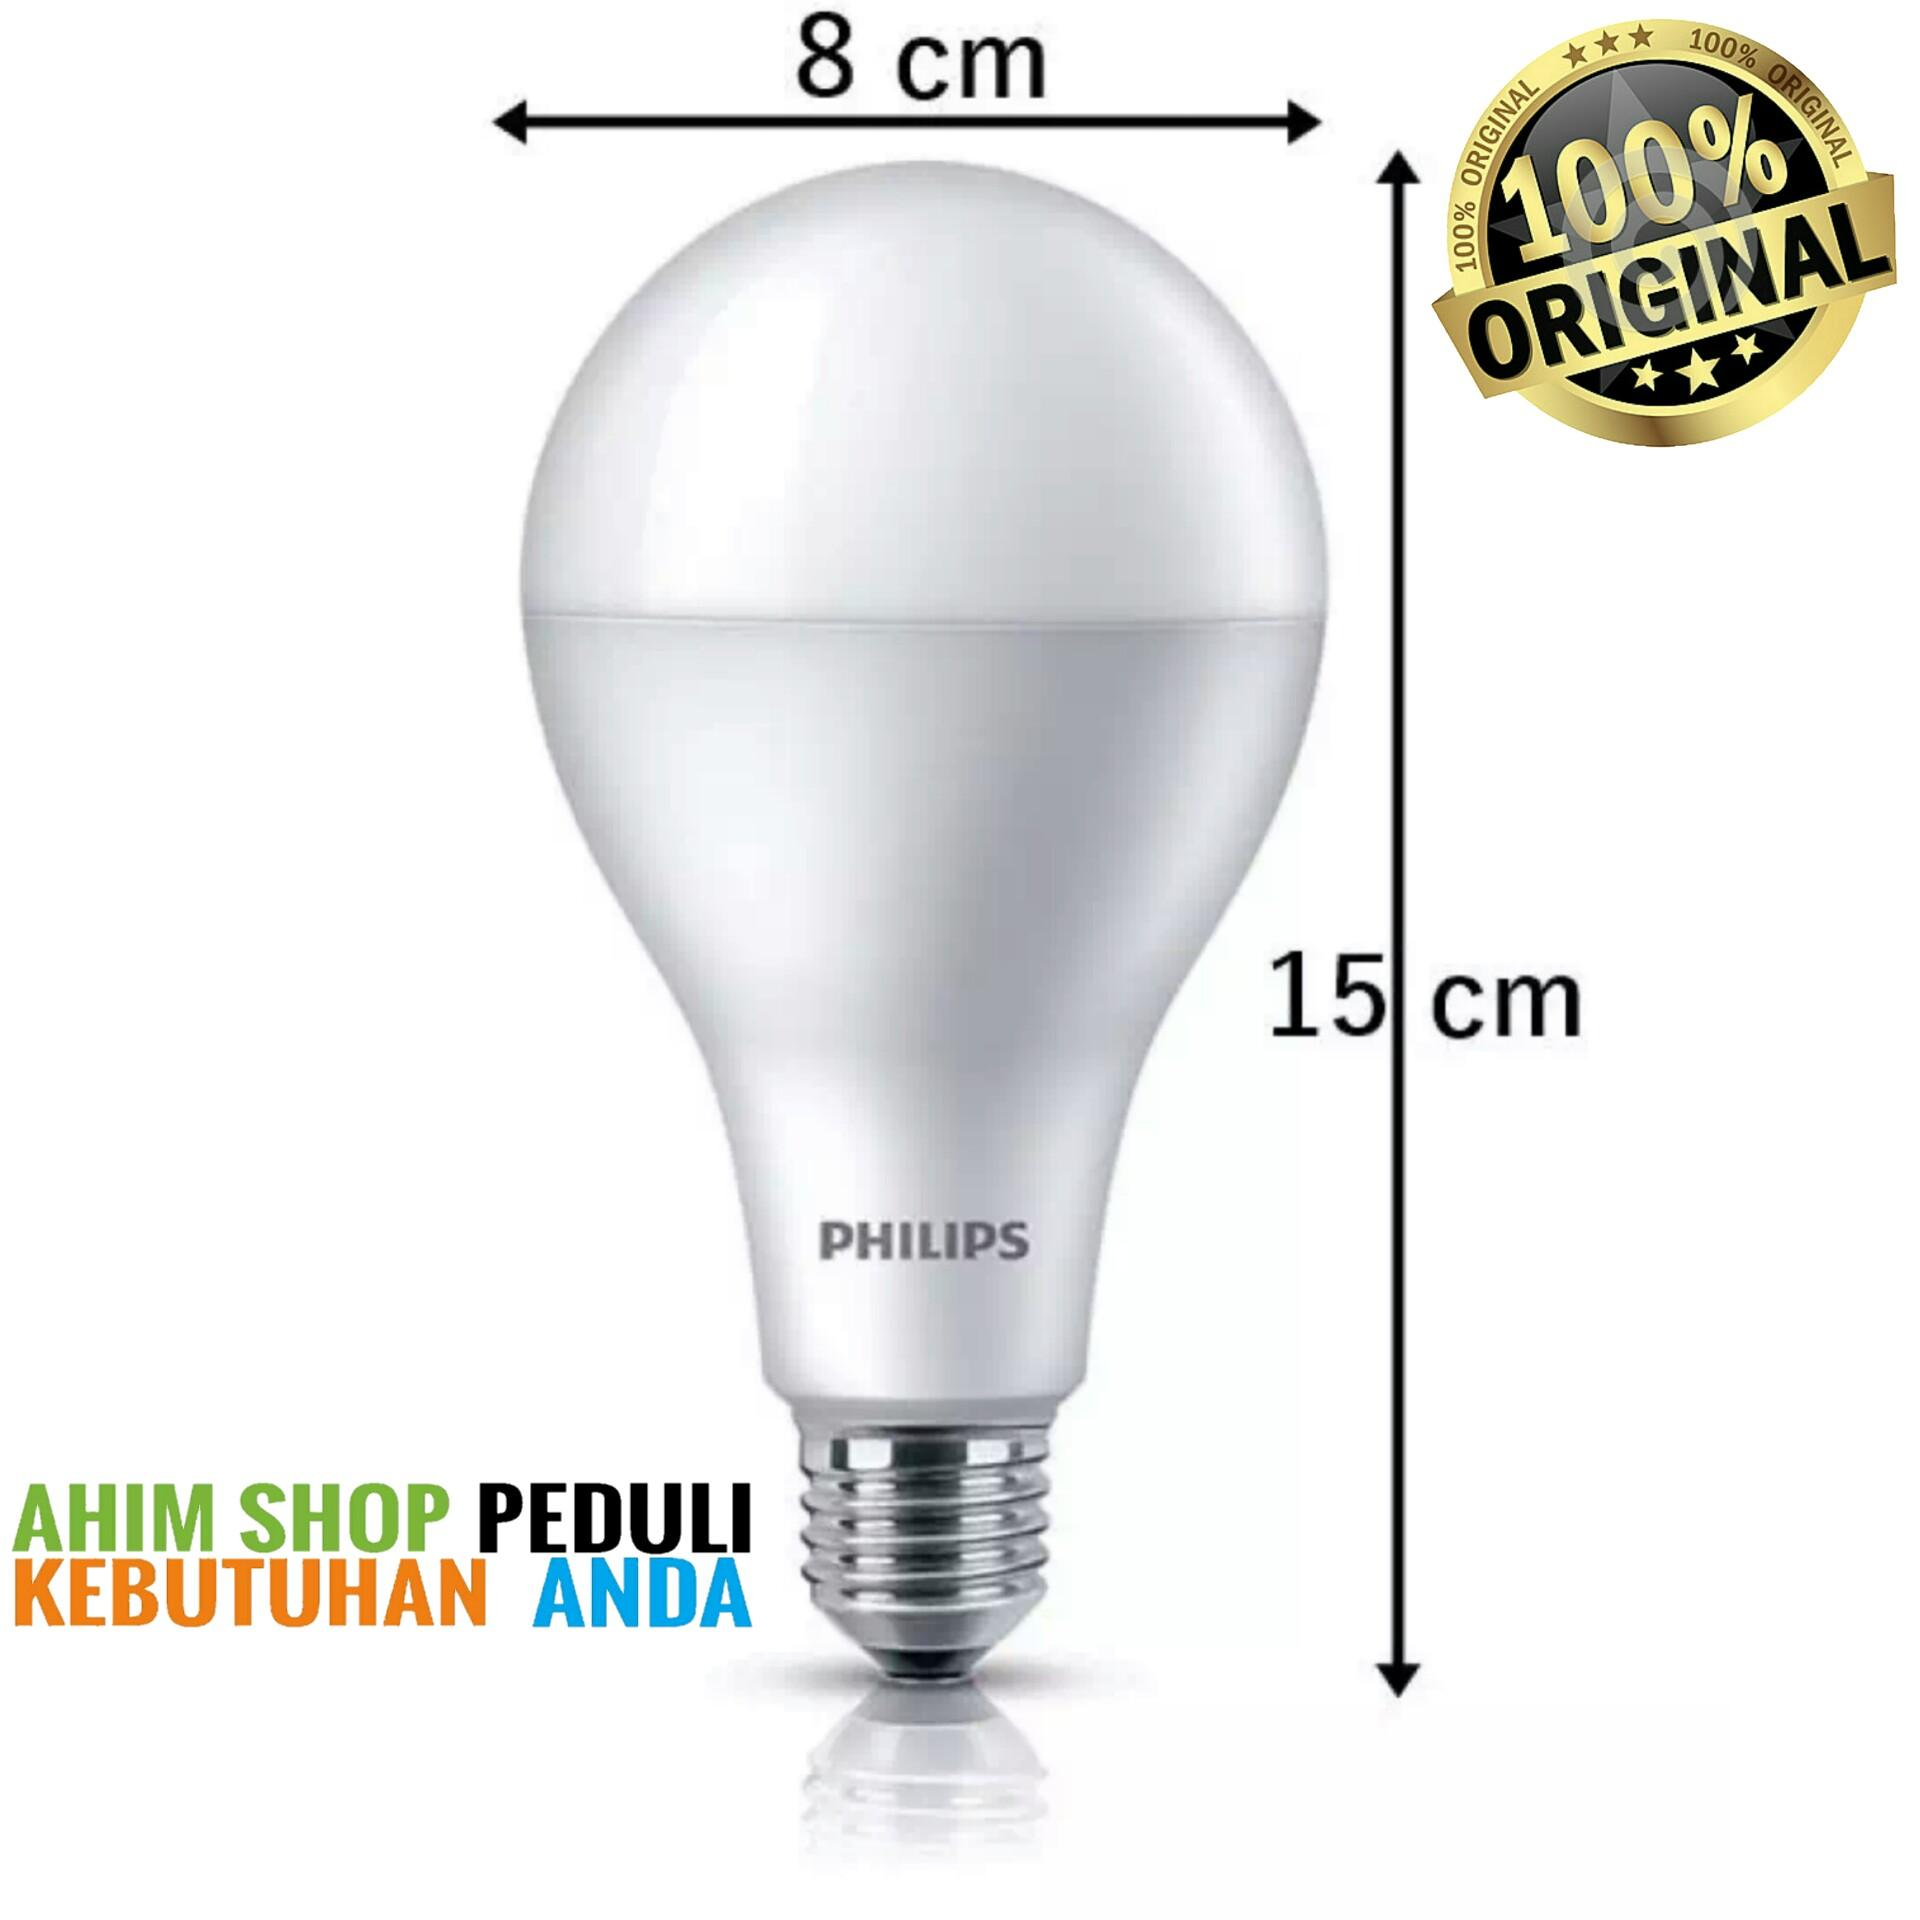 Detail Gambar PHILIPS Lampu Led Bulb JUMBO 19 Watt 19W 19Wat 19 W Putih Cool Daylight Ahim Shop Terbaru